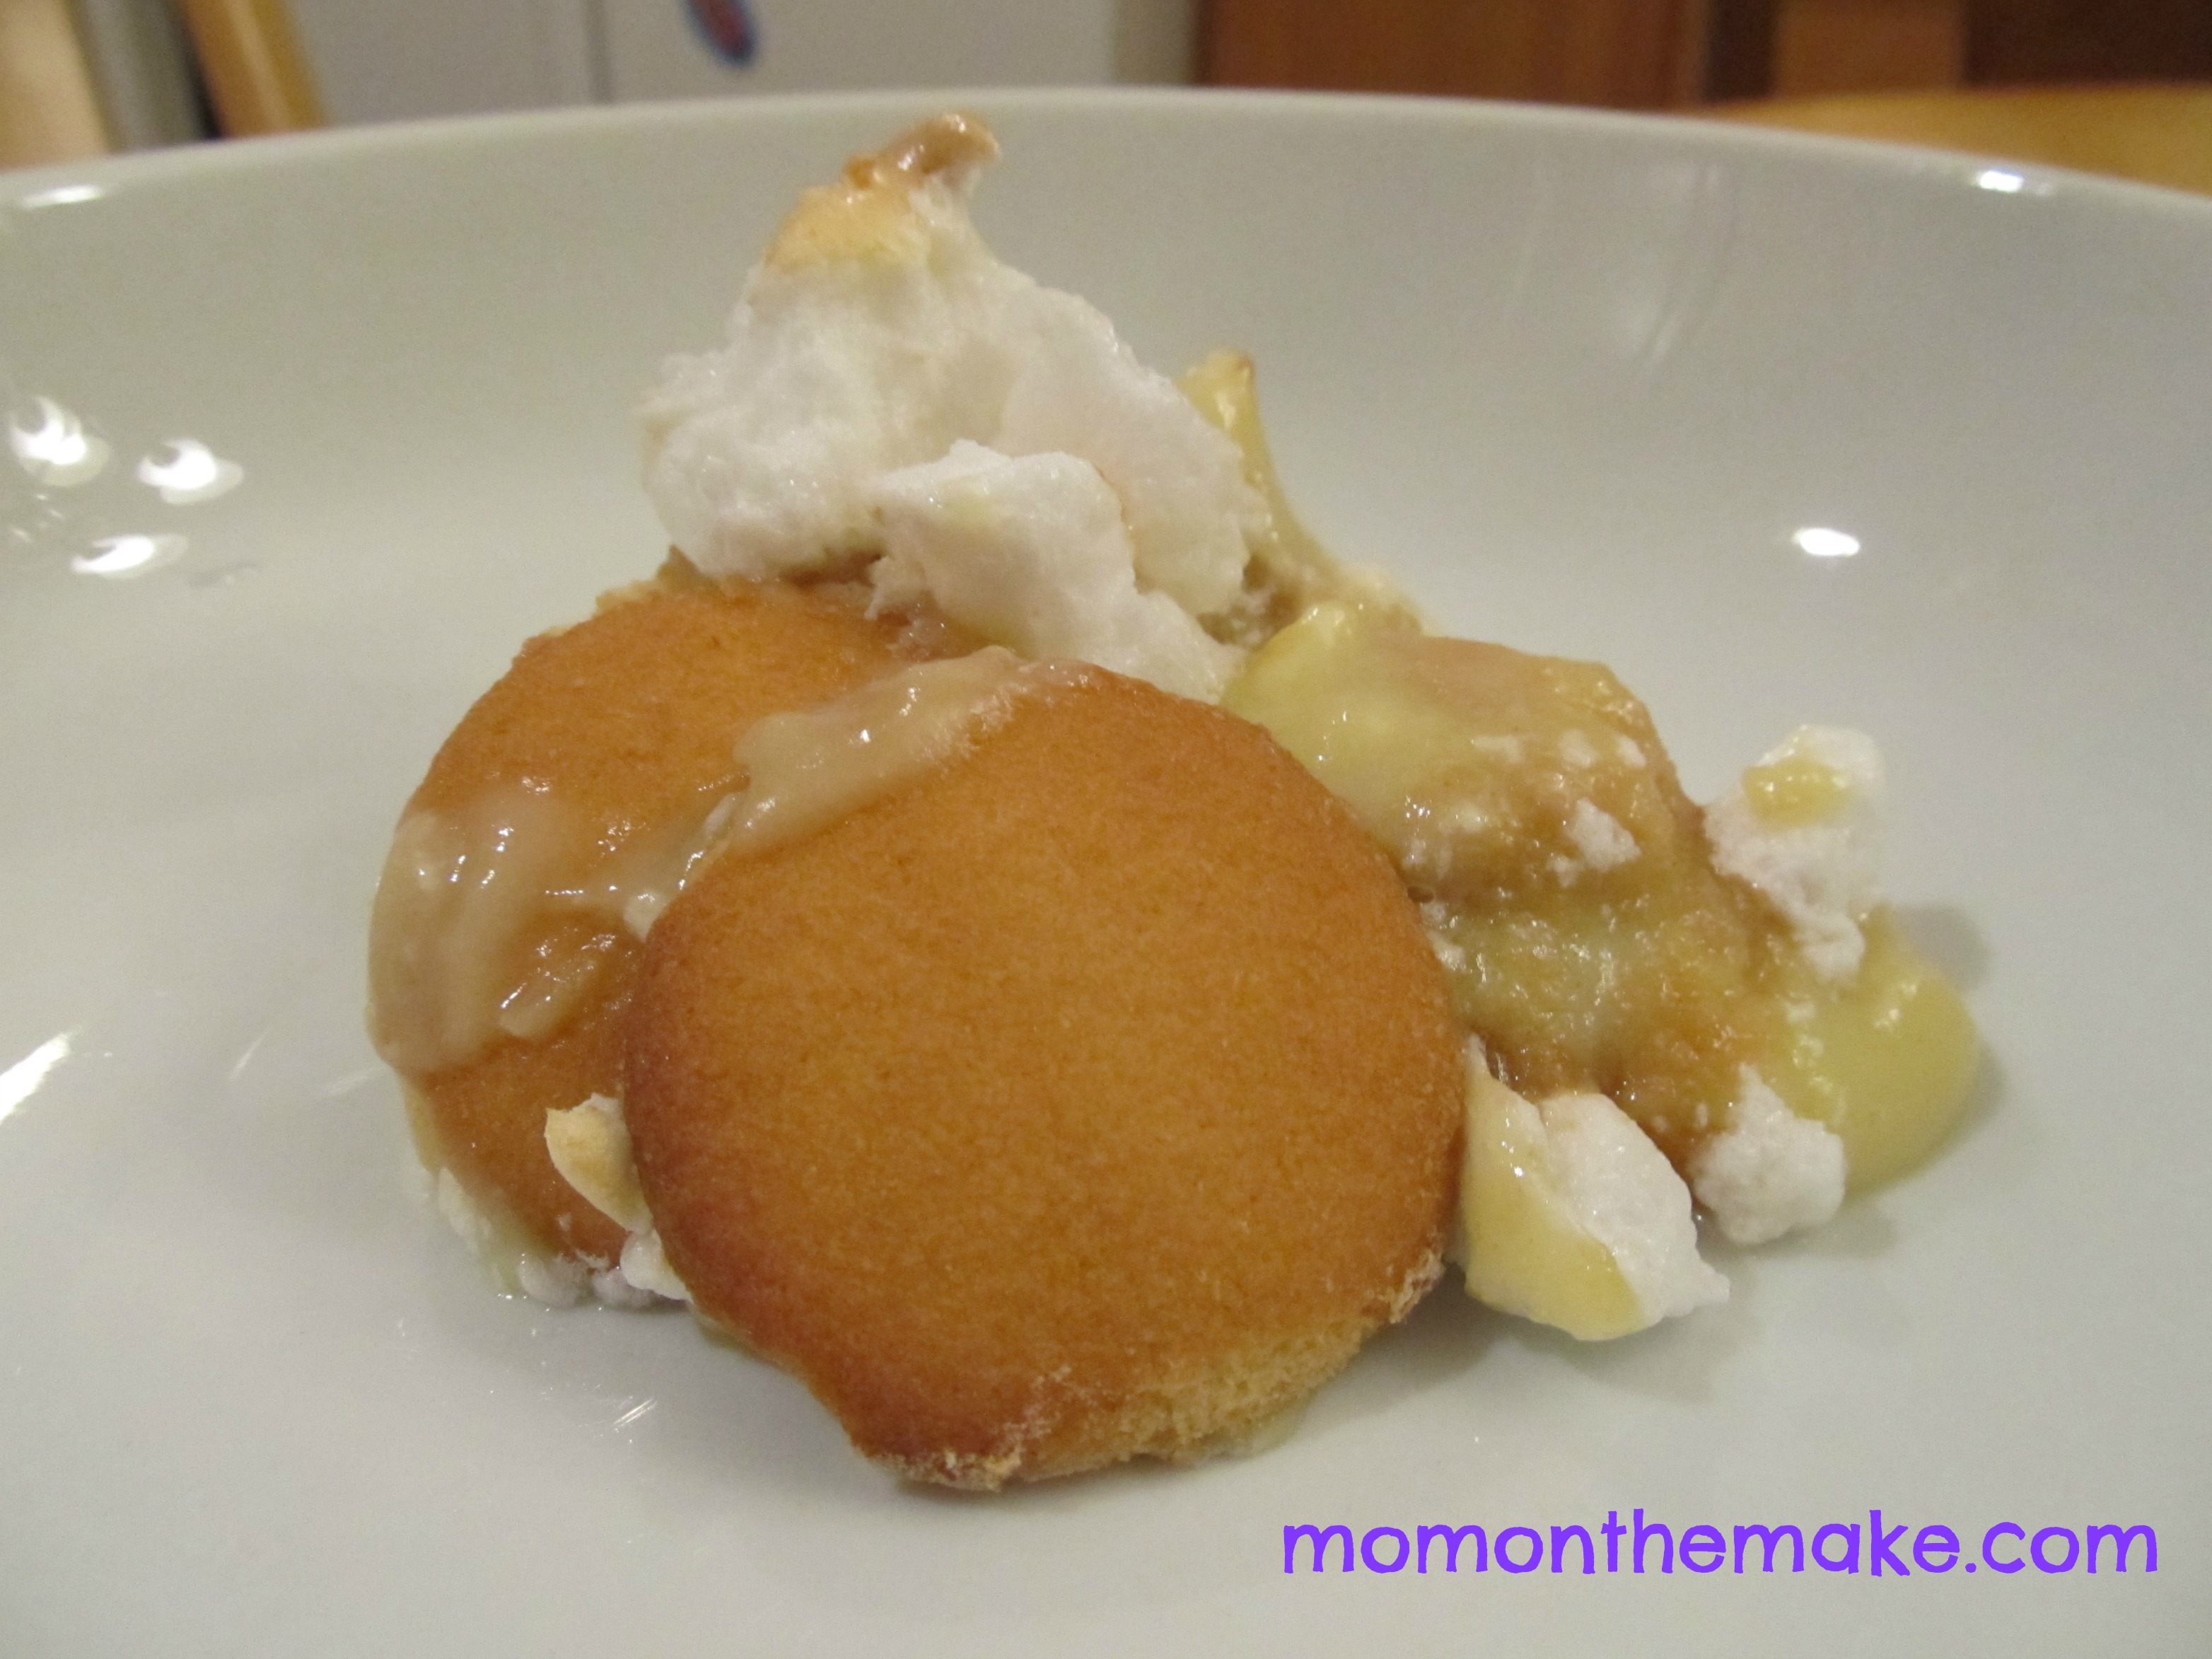 nilla wafer banana pudding recipe | Mom on the Make